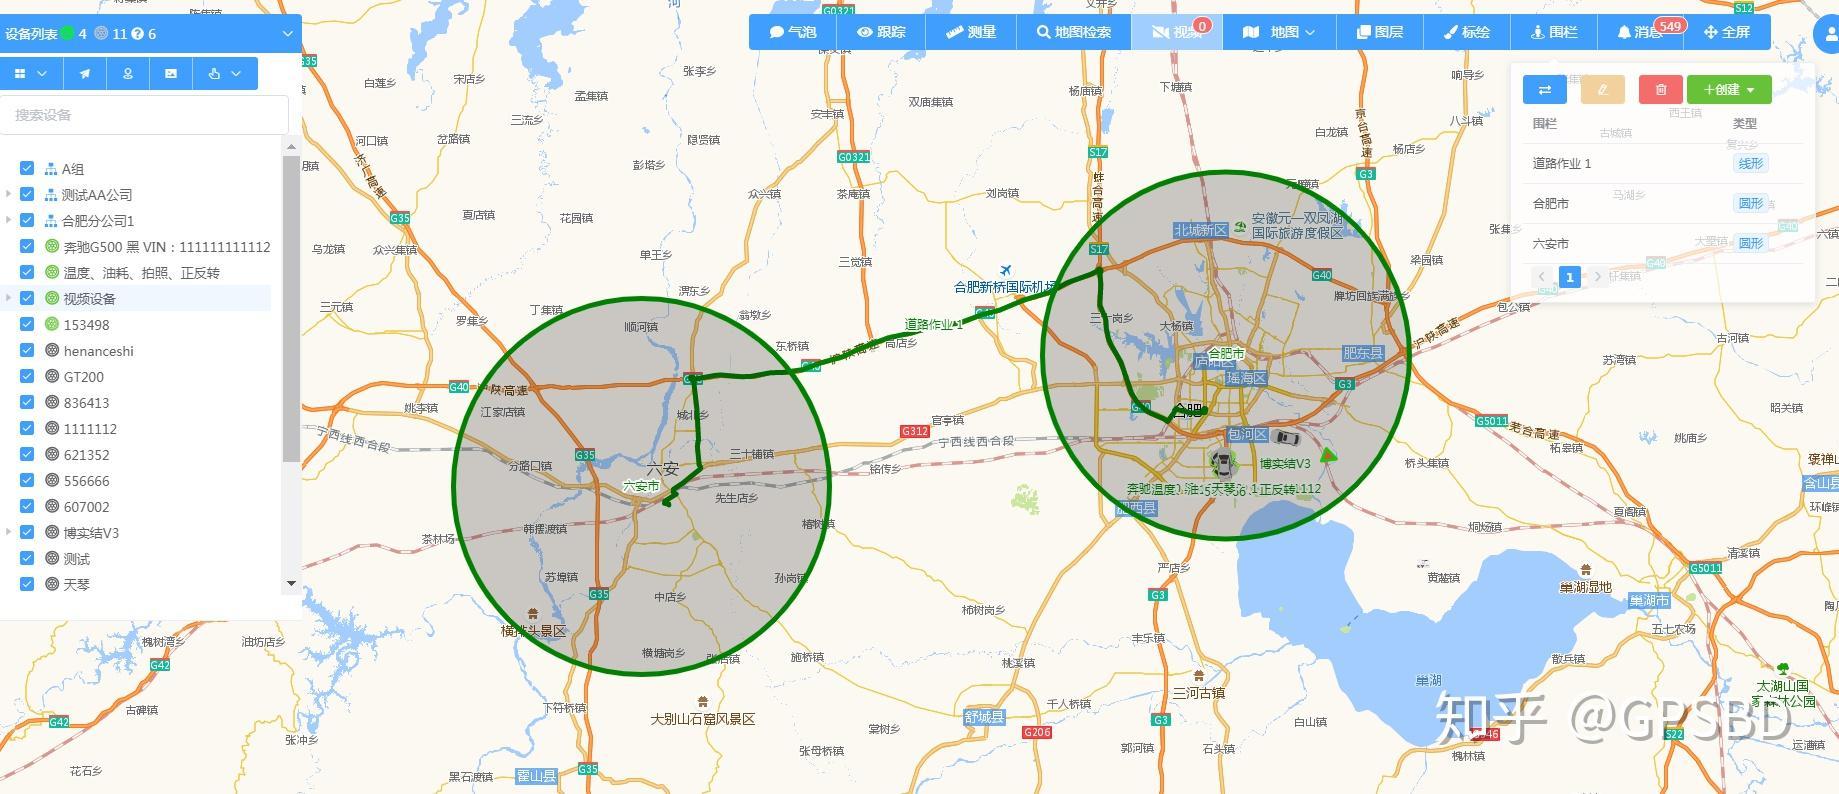 GPSBD卫星定位监控系统 路径规划